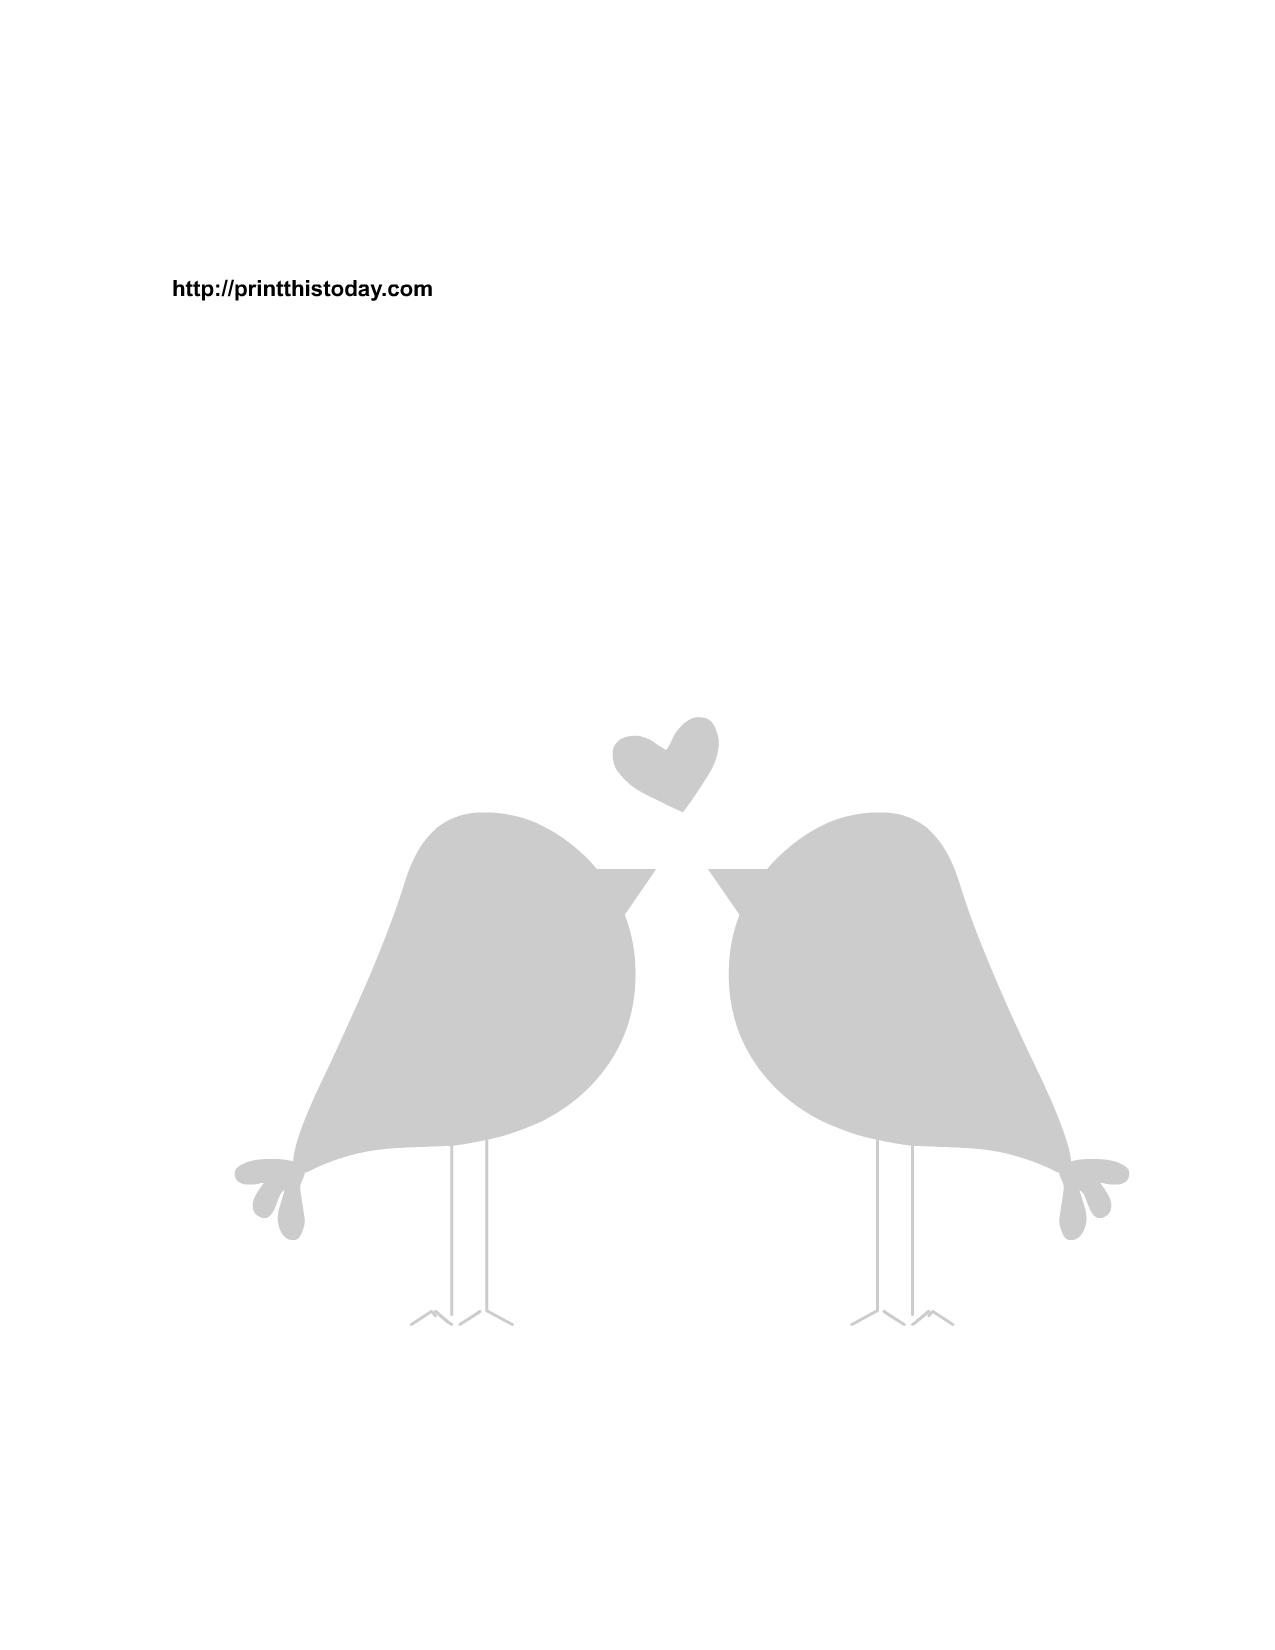 Free Printable Love Birds Stencils Print This Today Bird Stencil Owl Stencil Wall Stencil Template